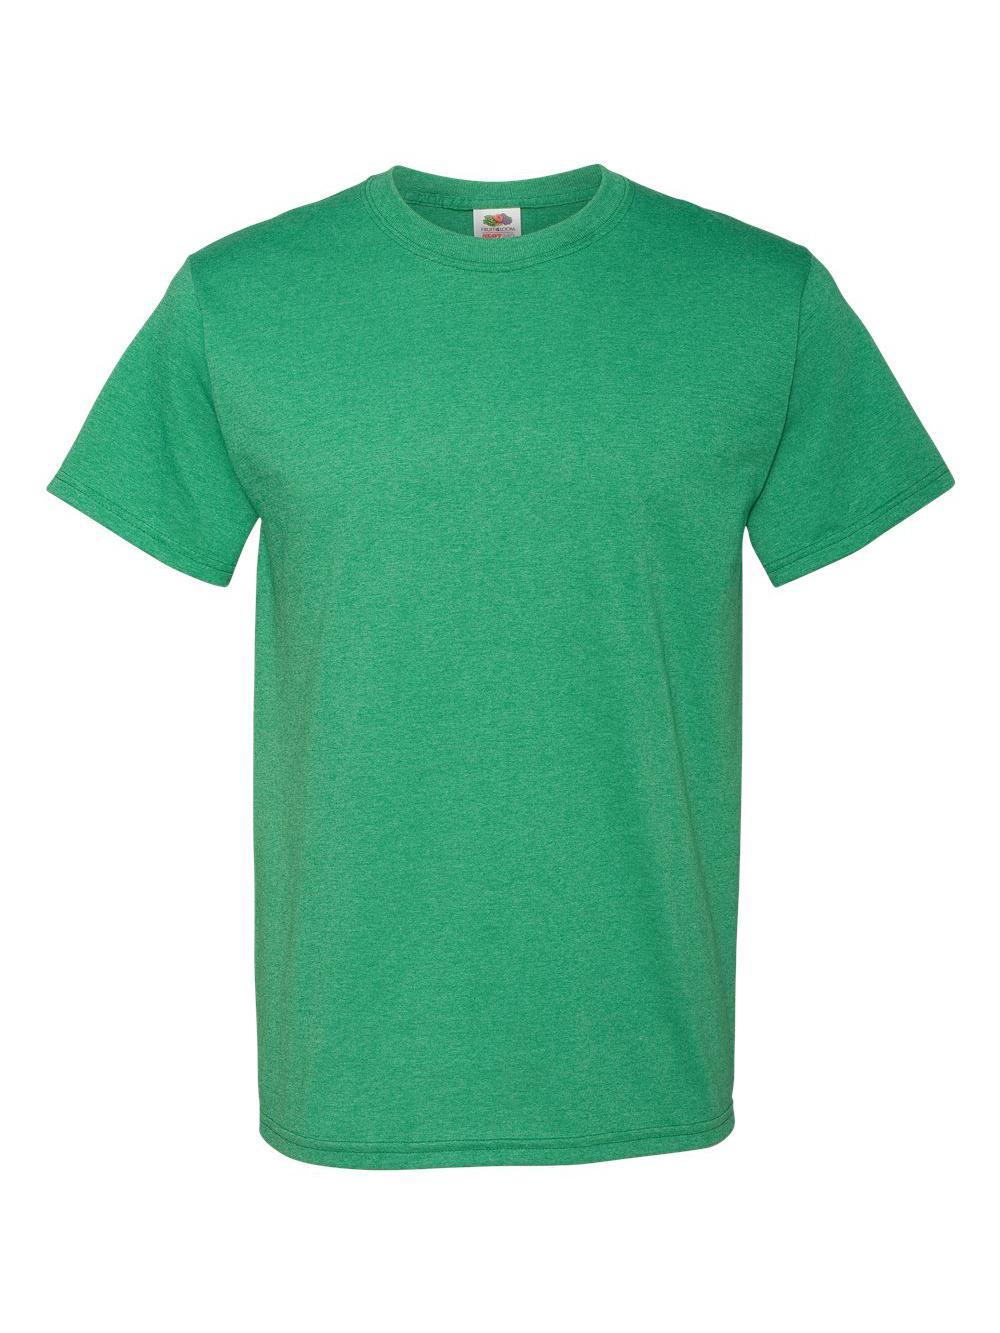 Fruit-of-the-Loom-HD-Cotton-Short-Sleeve-T-Shirt-3930R thumbnail 99